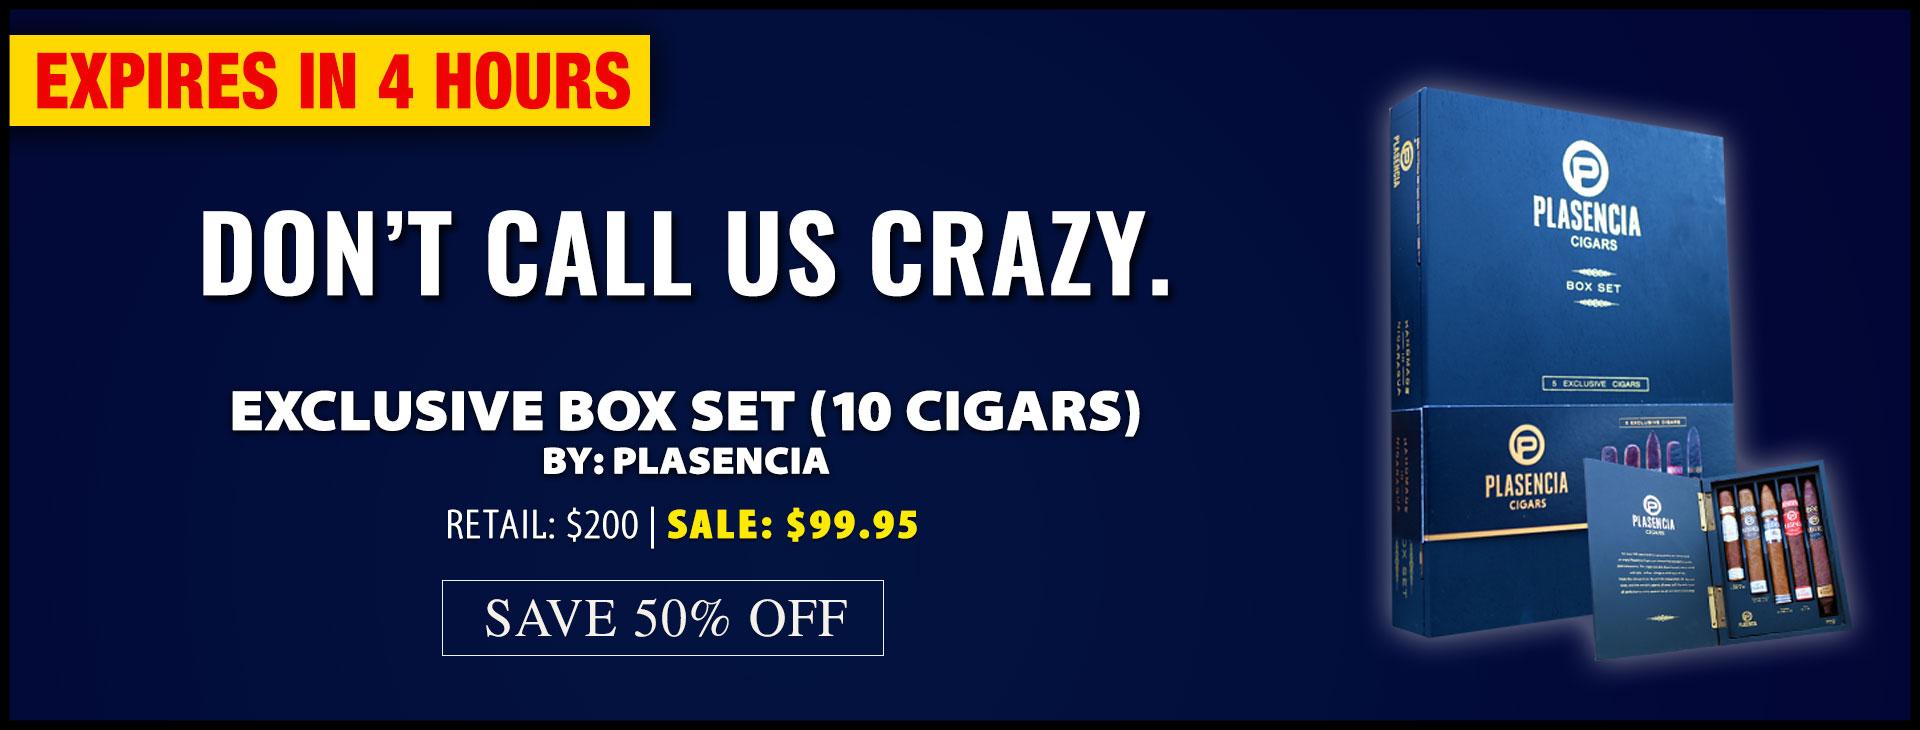 plasencia-exclusive-box-set-2021-banner.jpg